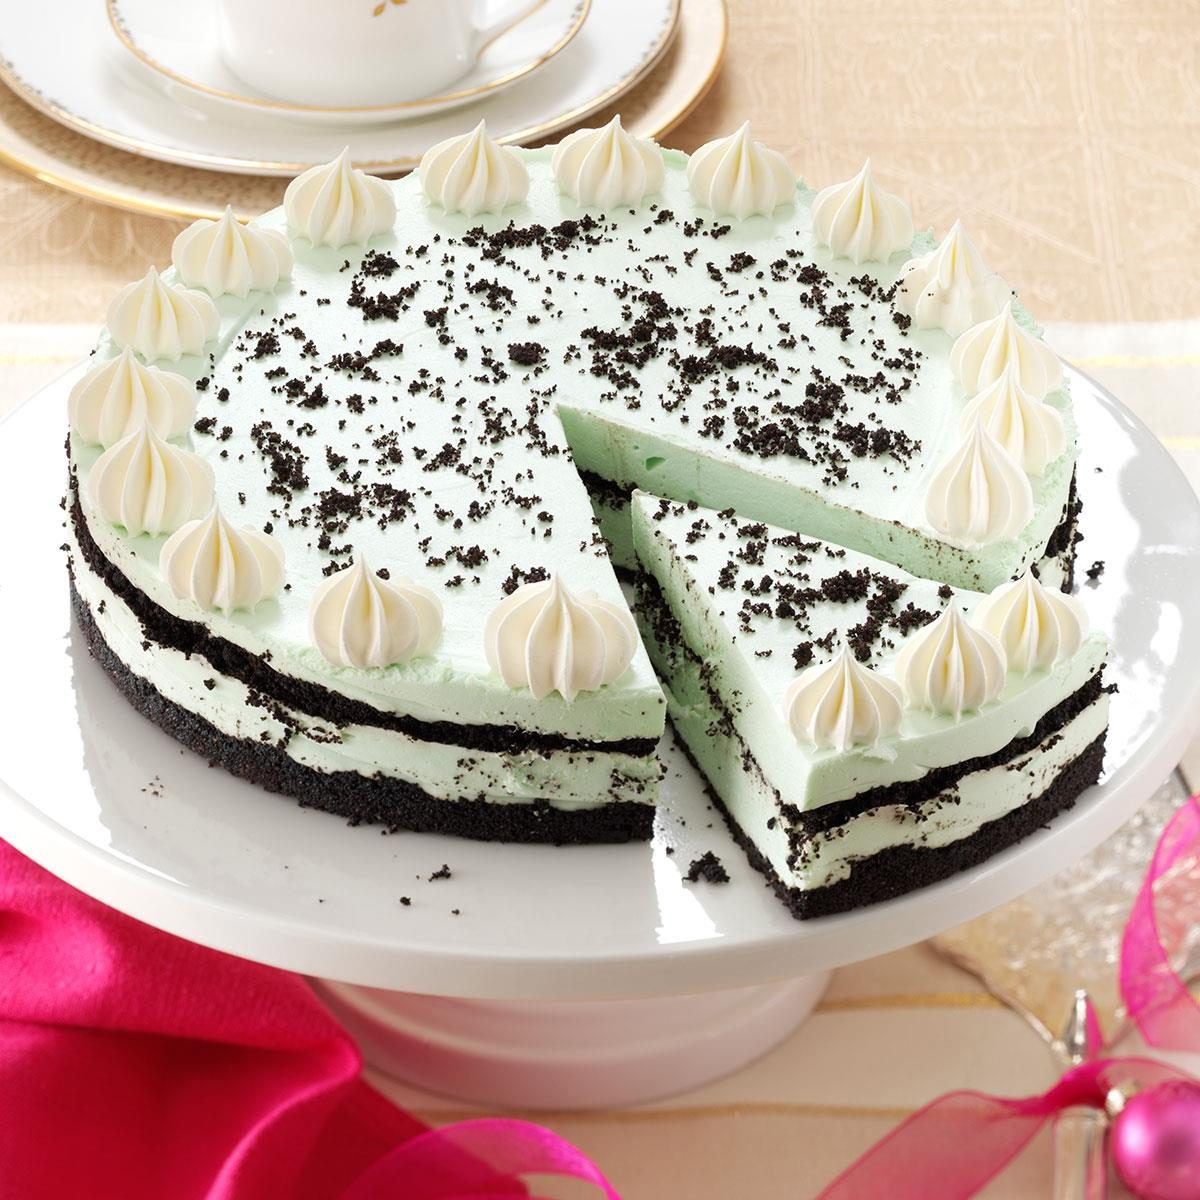 Grasshopper Cheesecake Recipe | Taste of Home